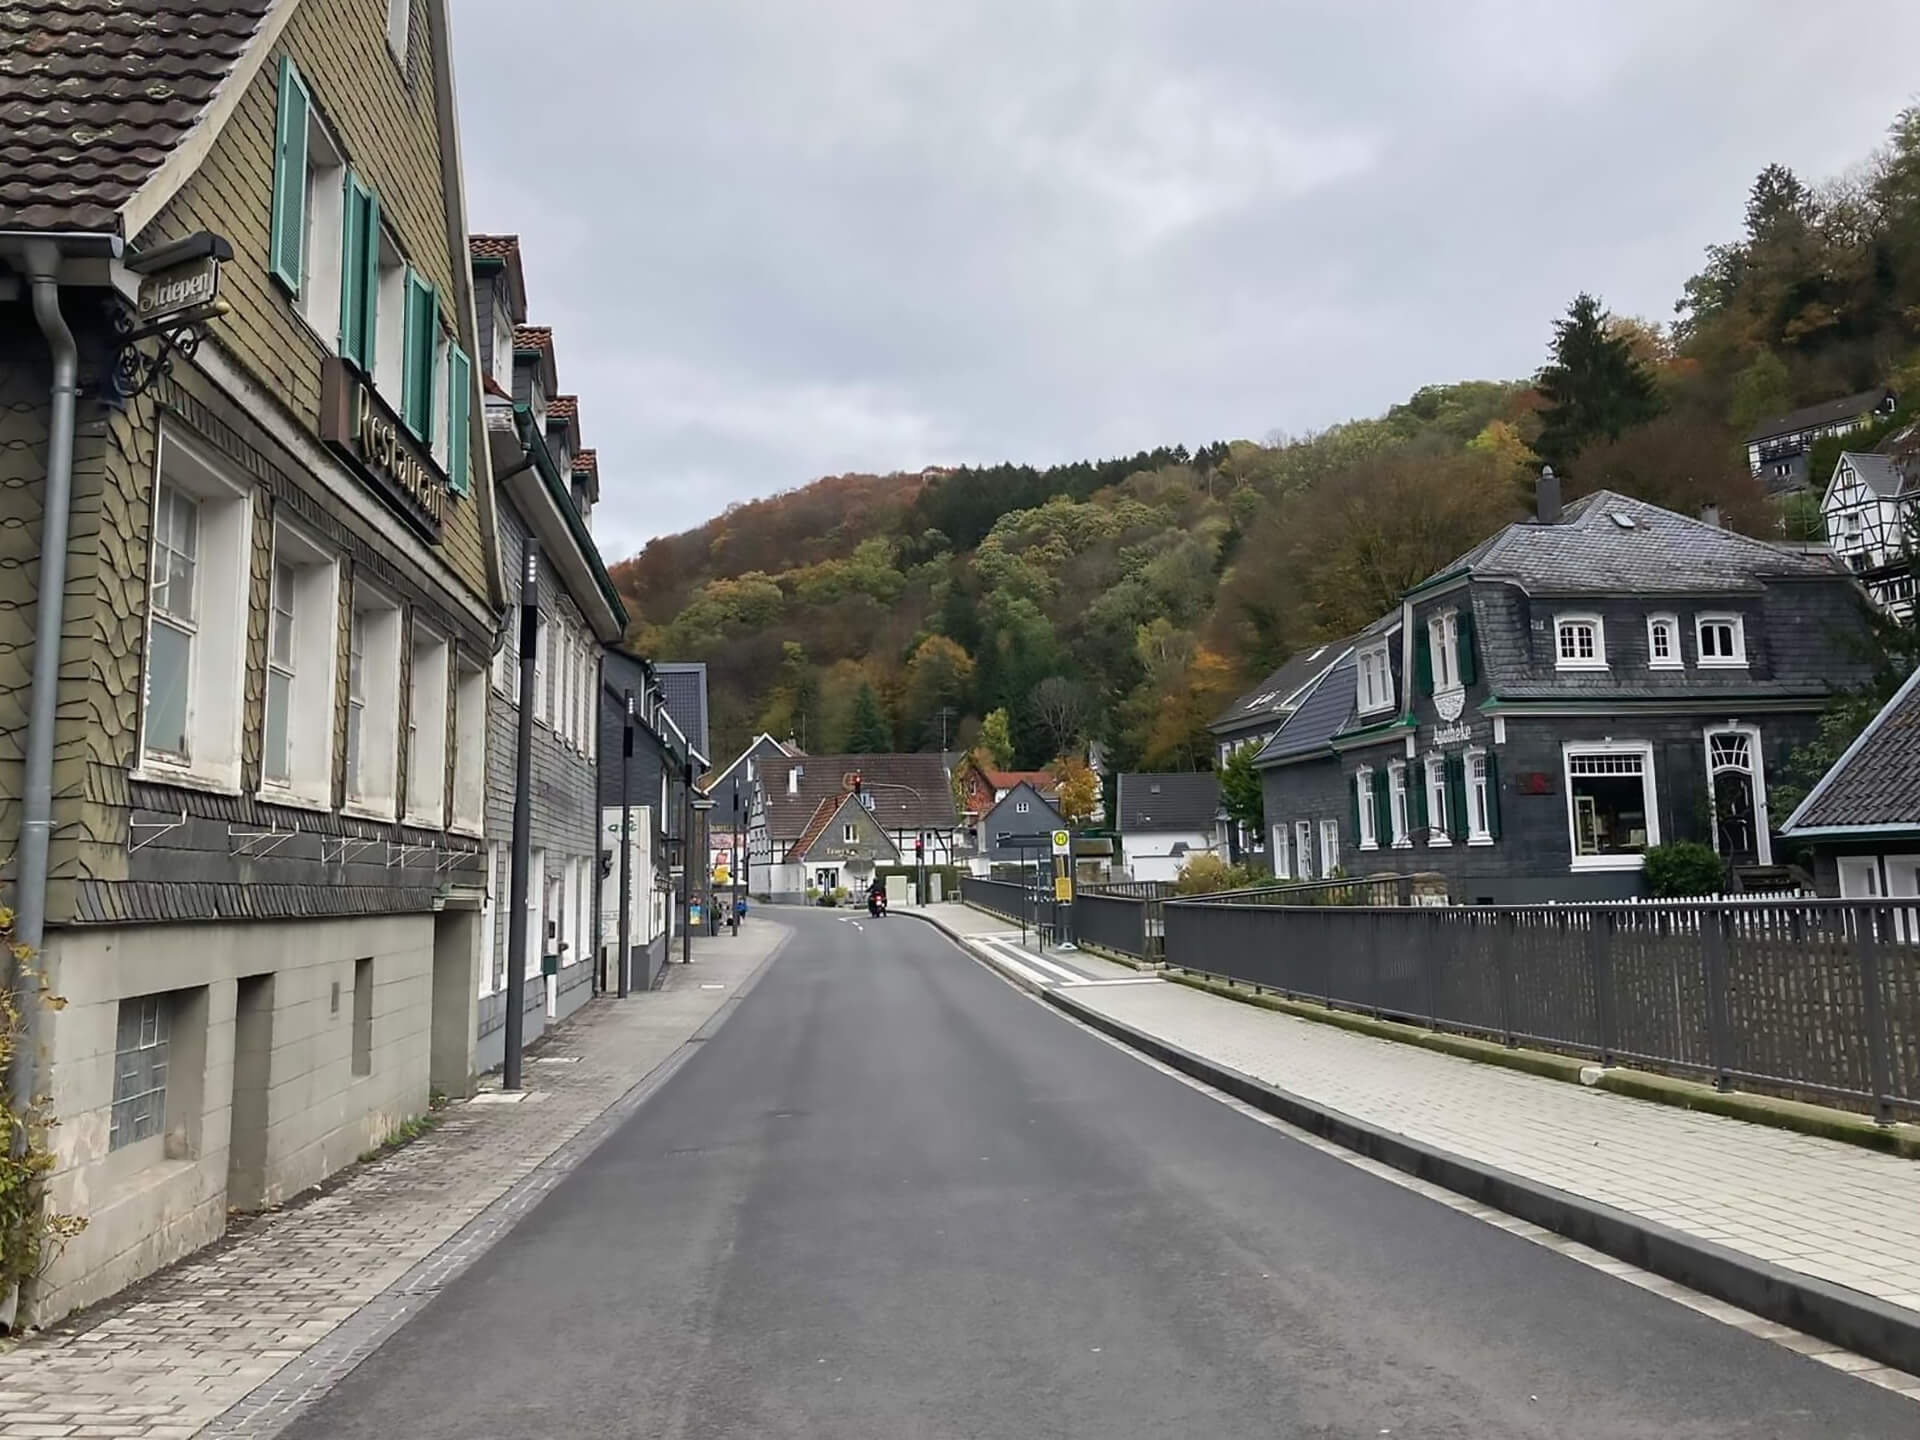 Umbau Eschbachstrasse in Solingen Burg Oktober 2020